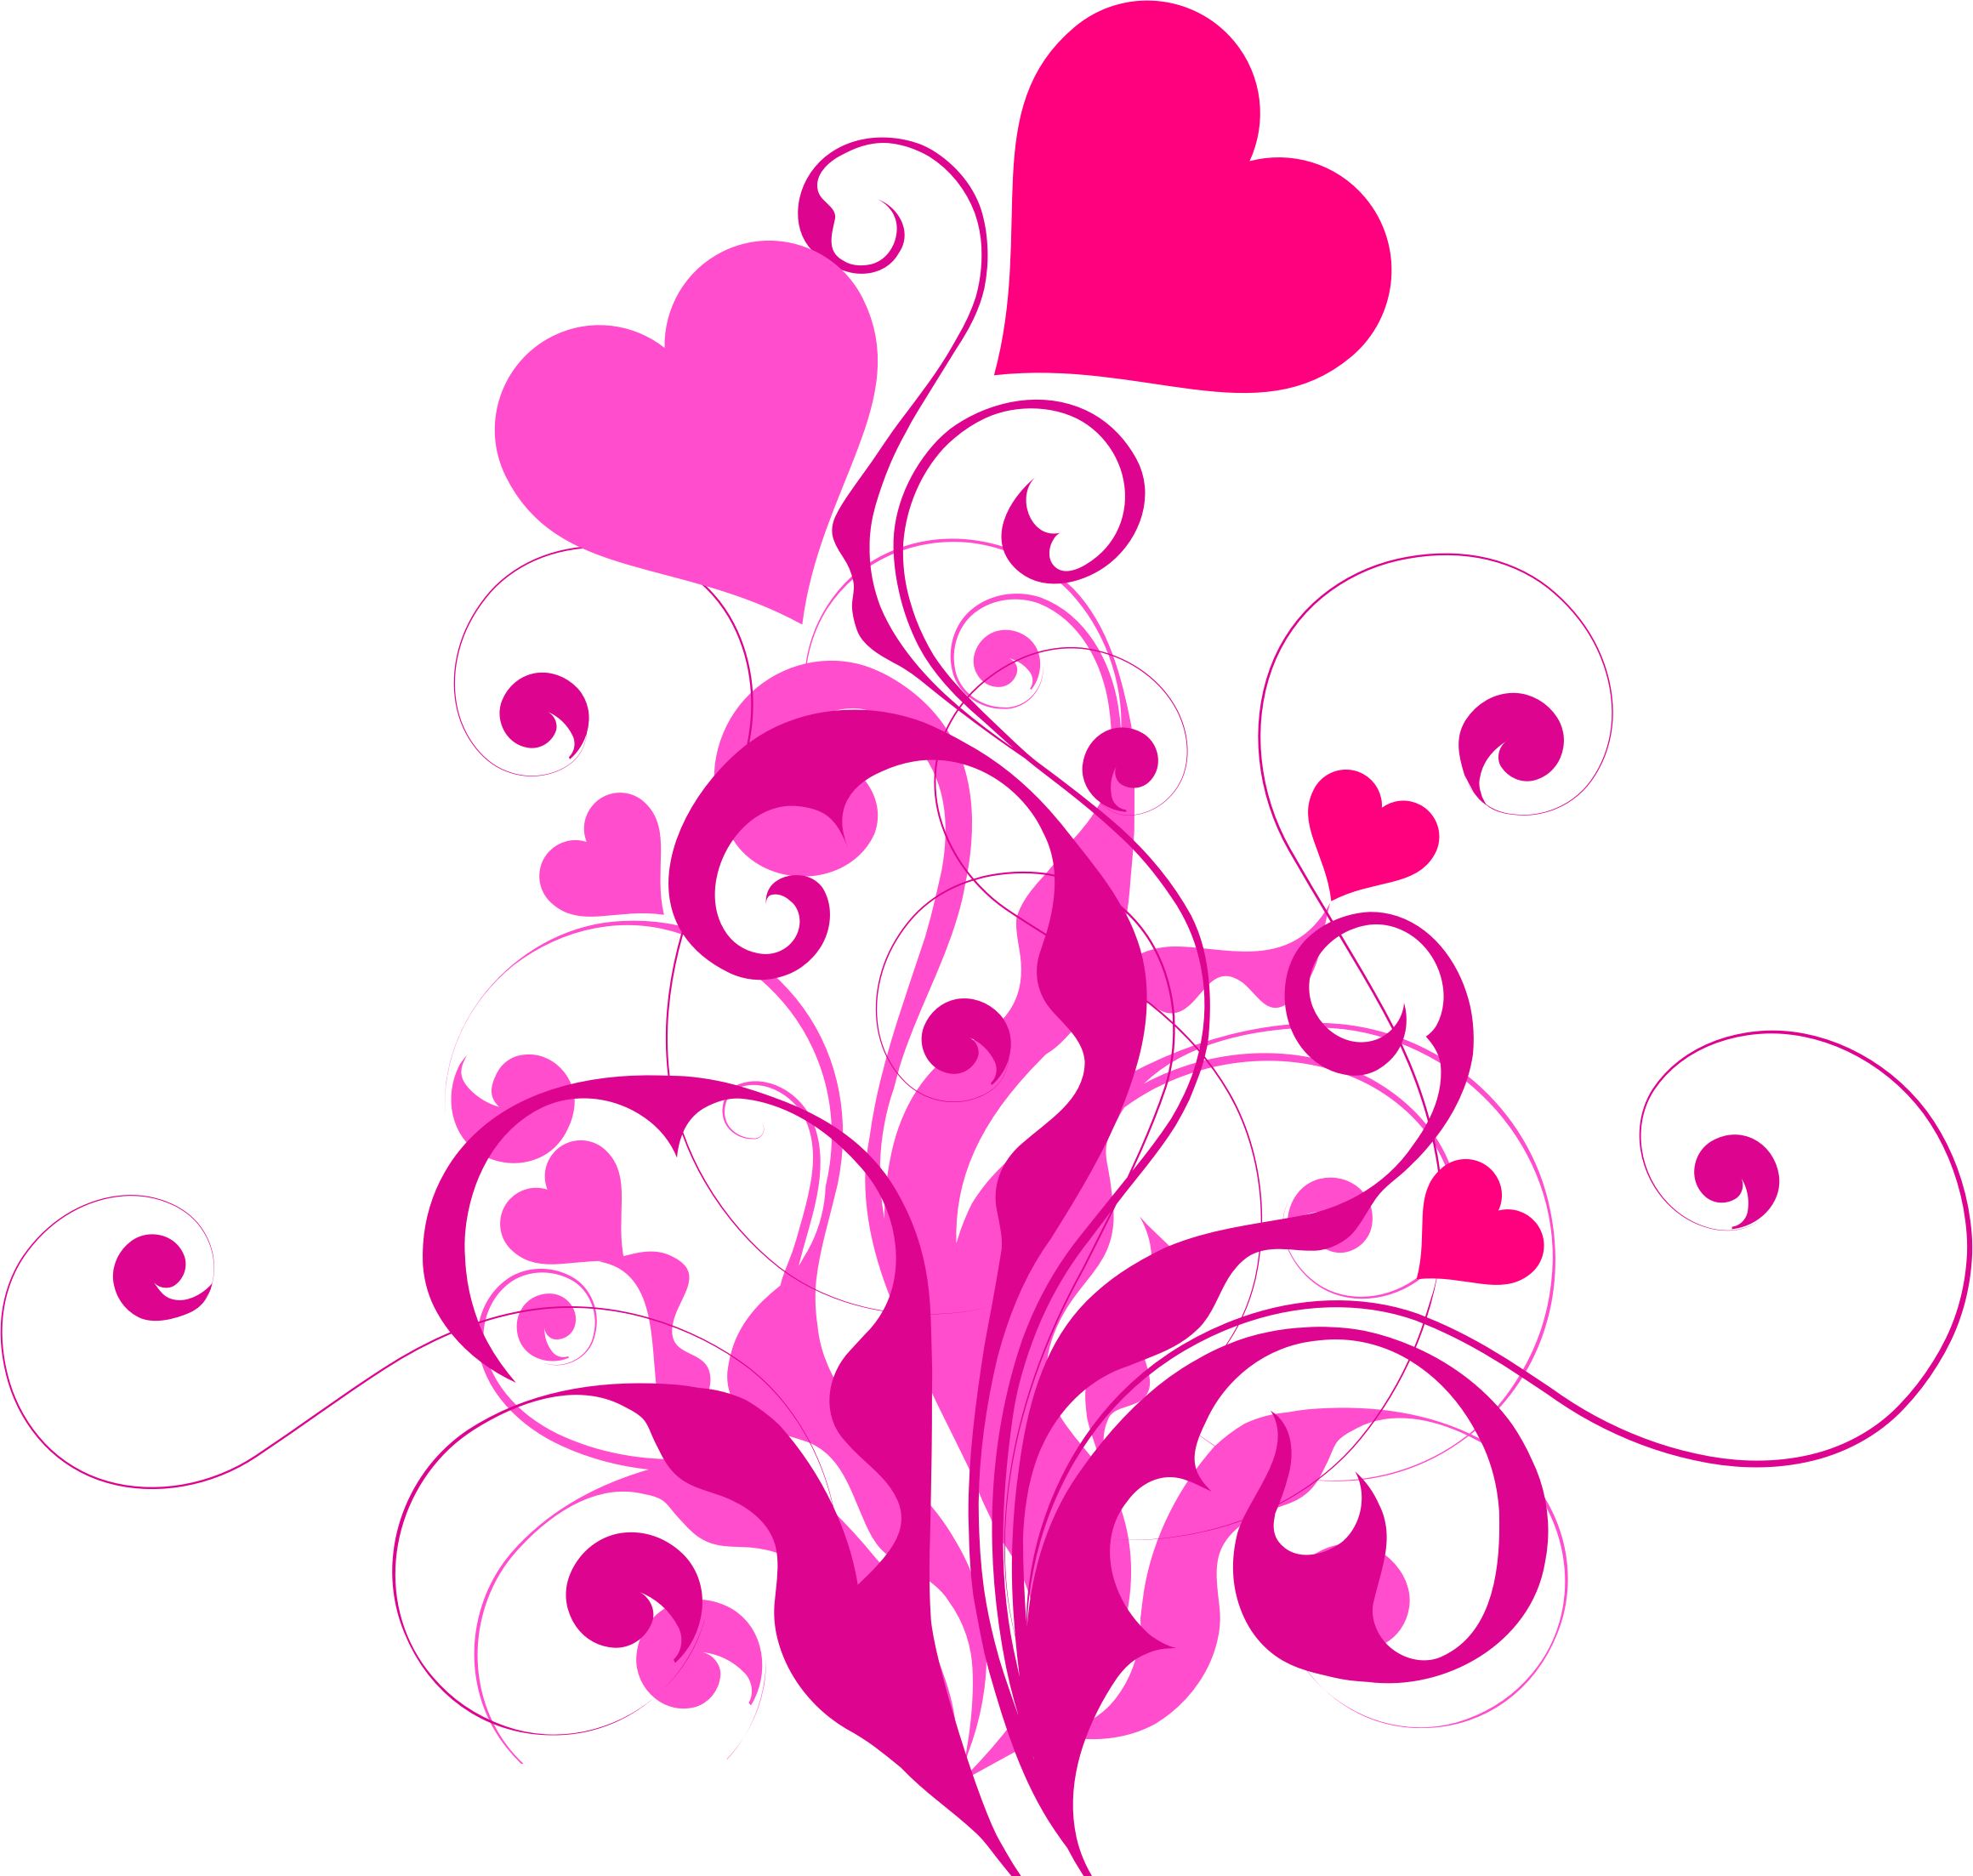 Flourish heart clipart jpg freeuse library Clipart - Heart Flourish jpg freeuse library